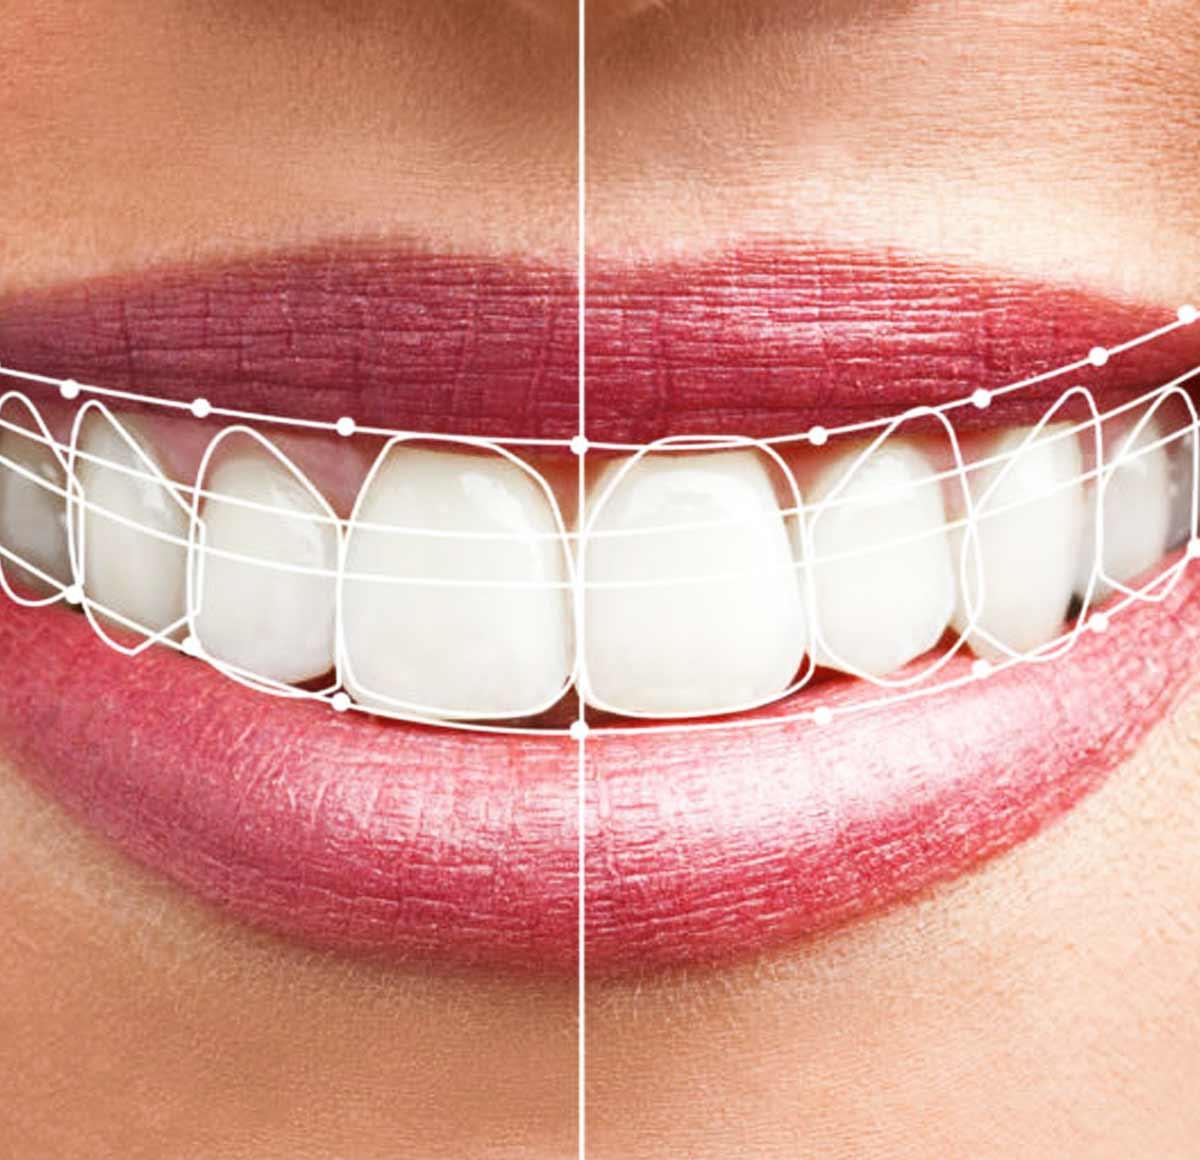 What is Digital Smile Design